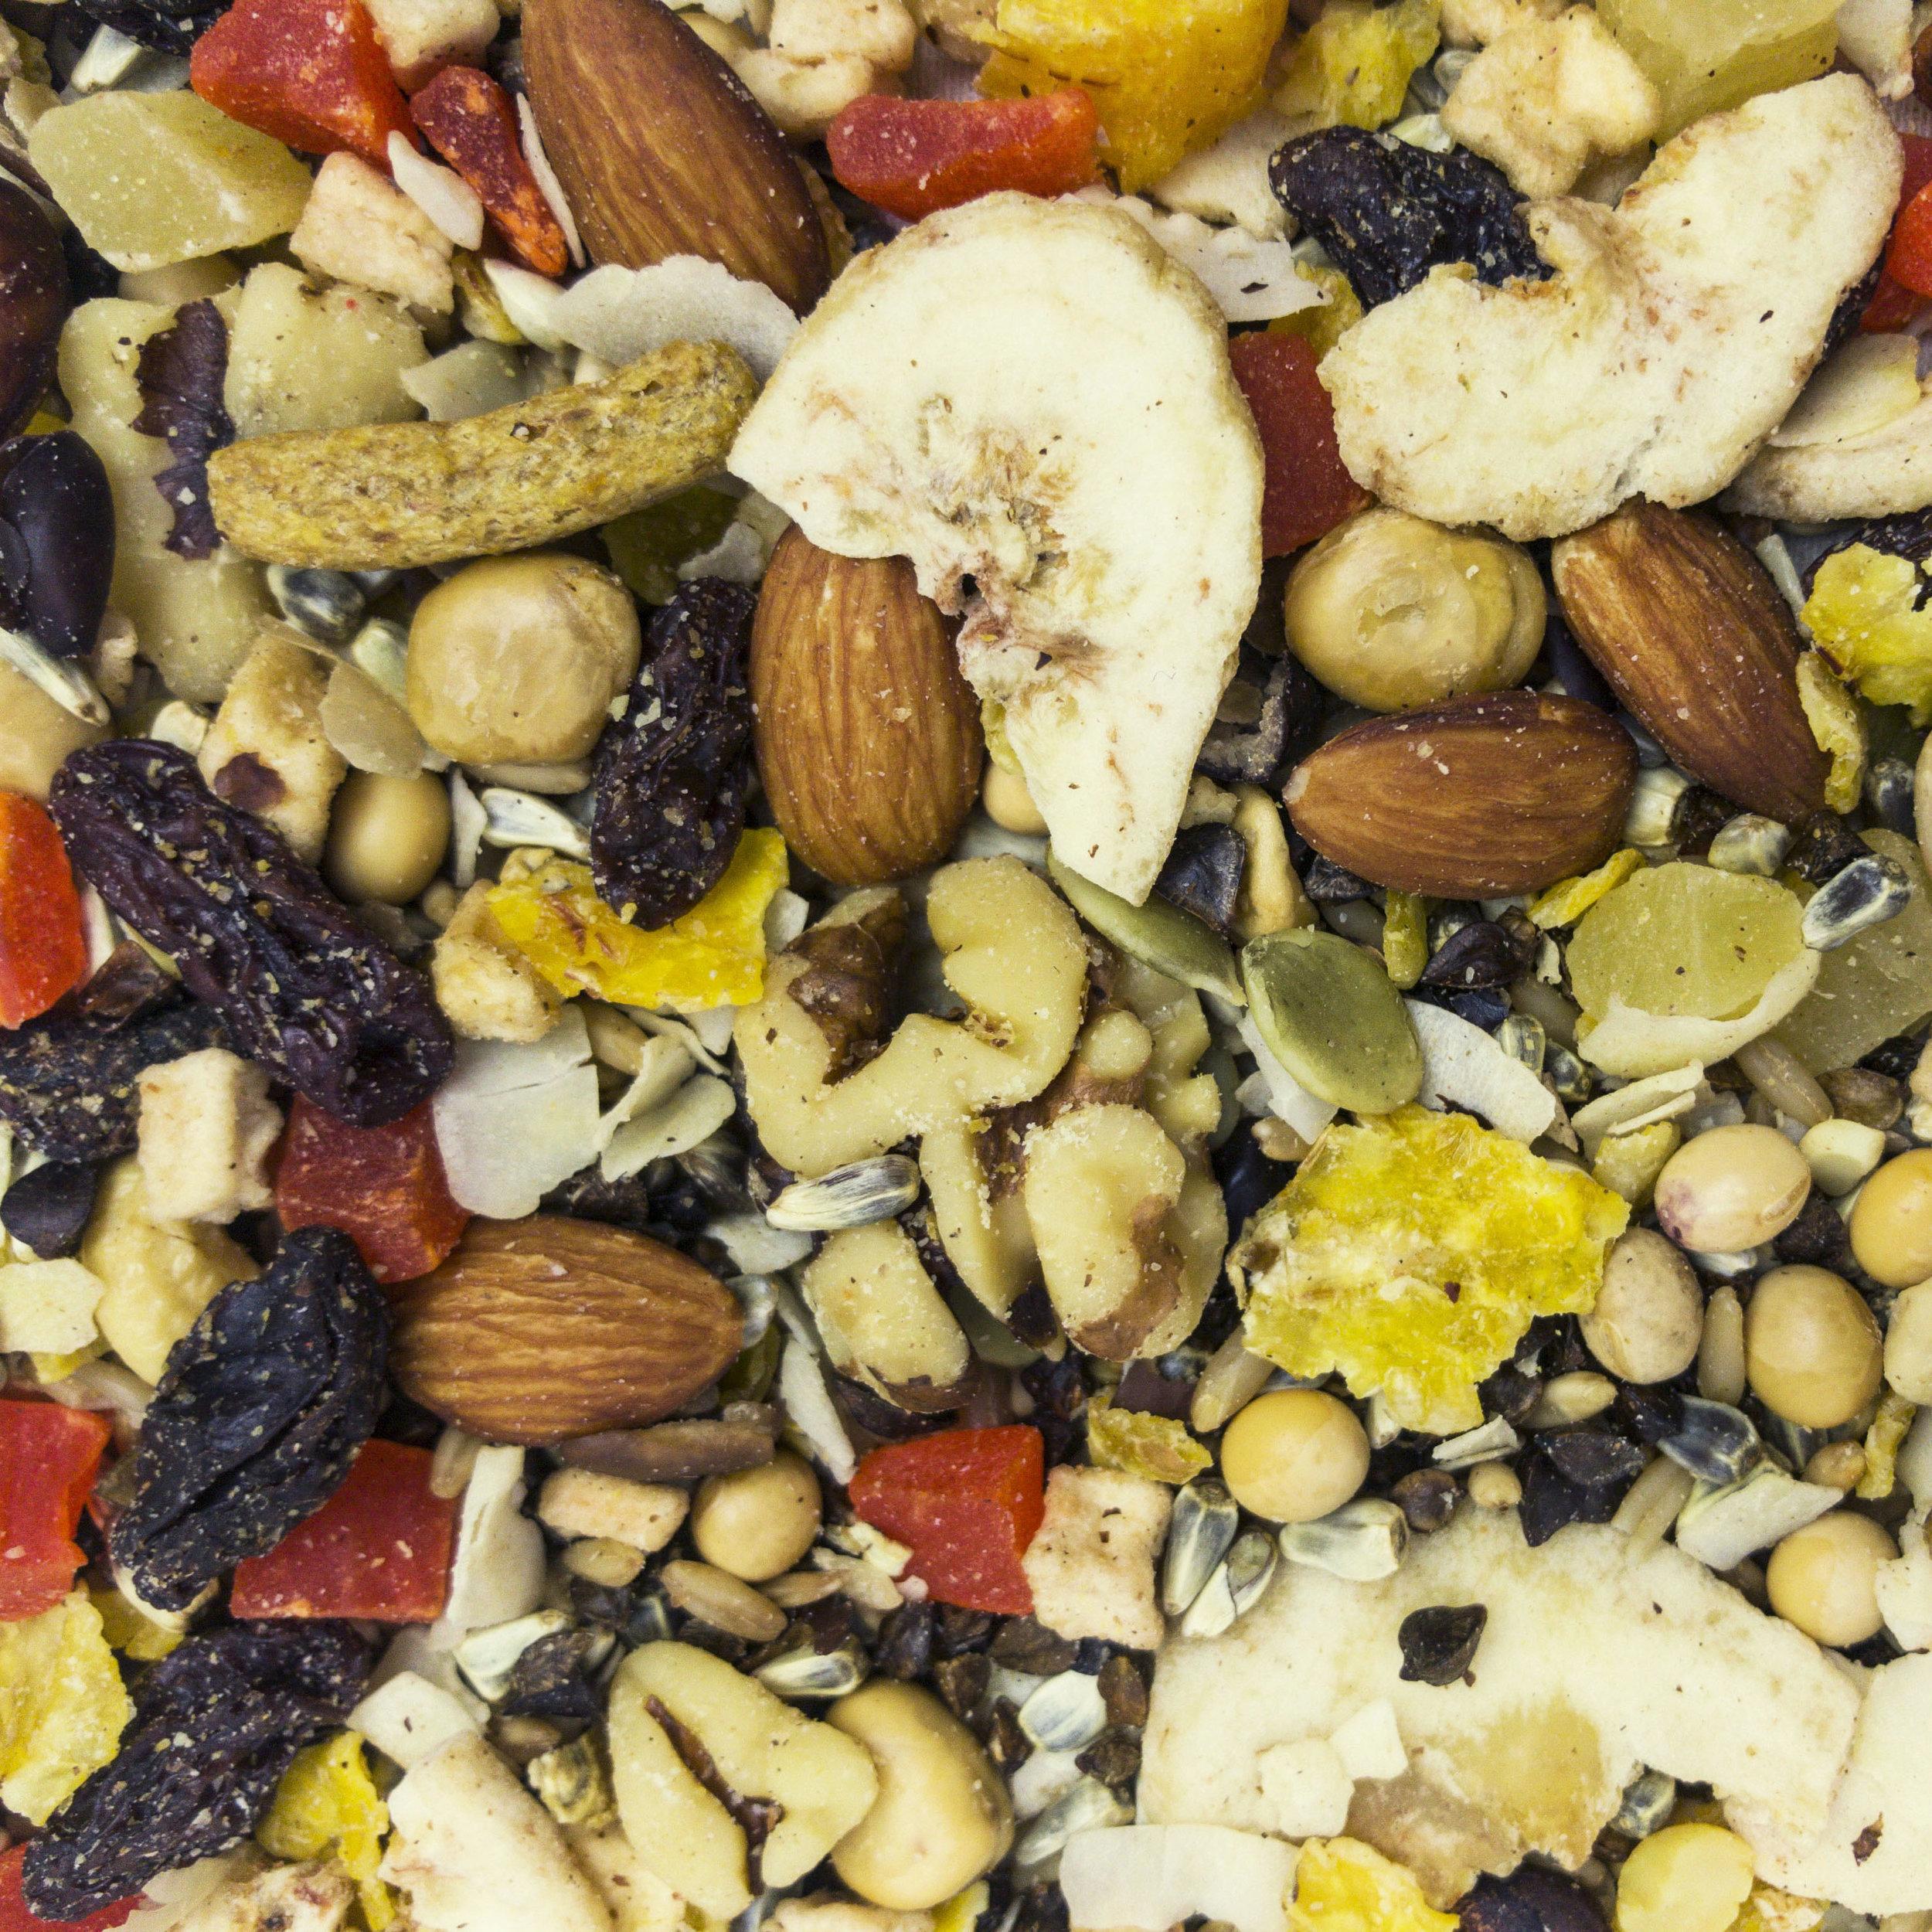 Sunburst Treats_Fruit to Nuts_Web.jpg